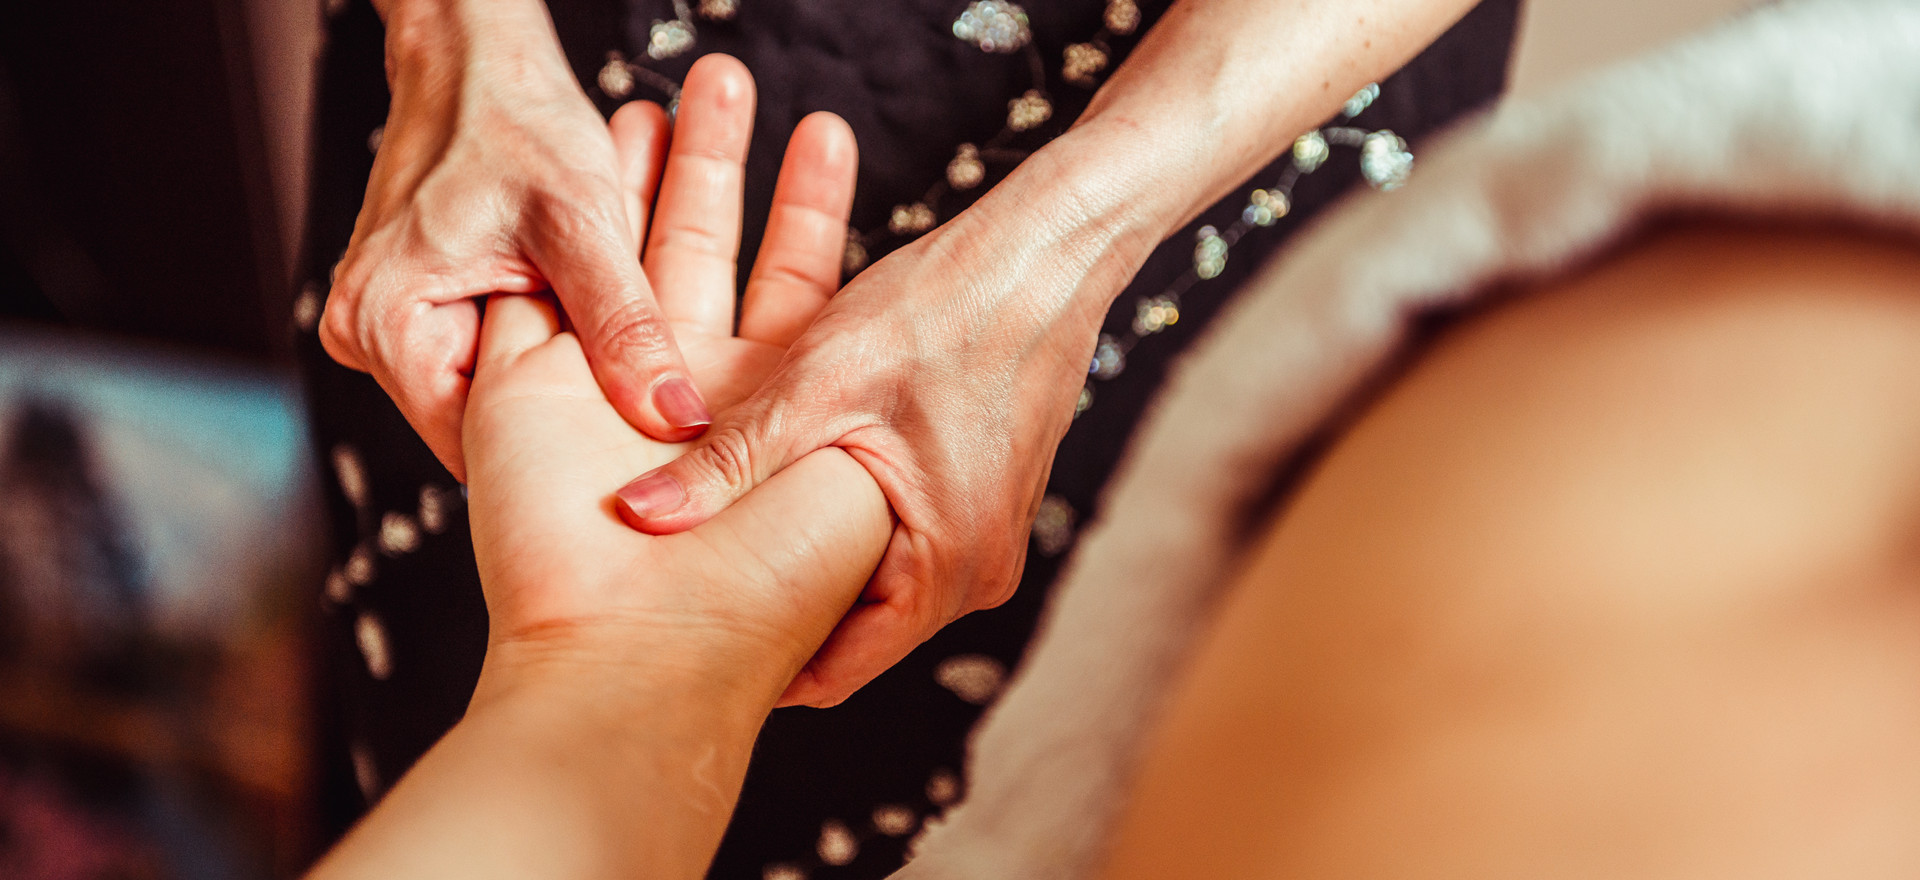 physical therapist massage hands.jpg